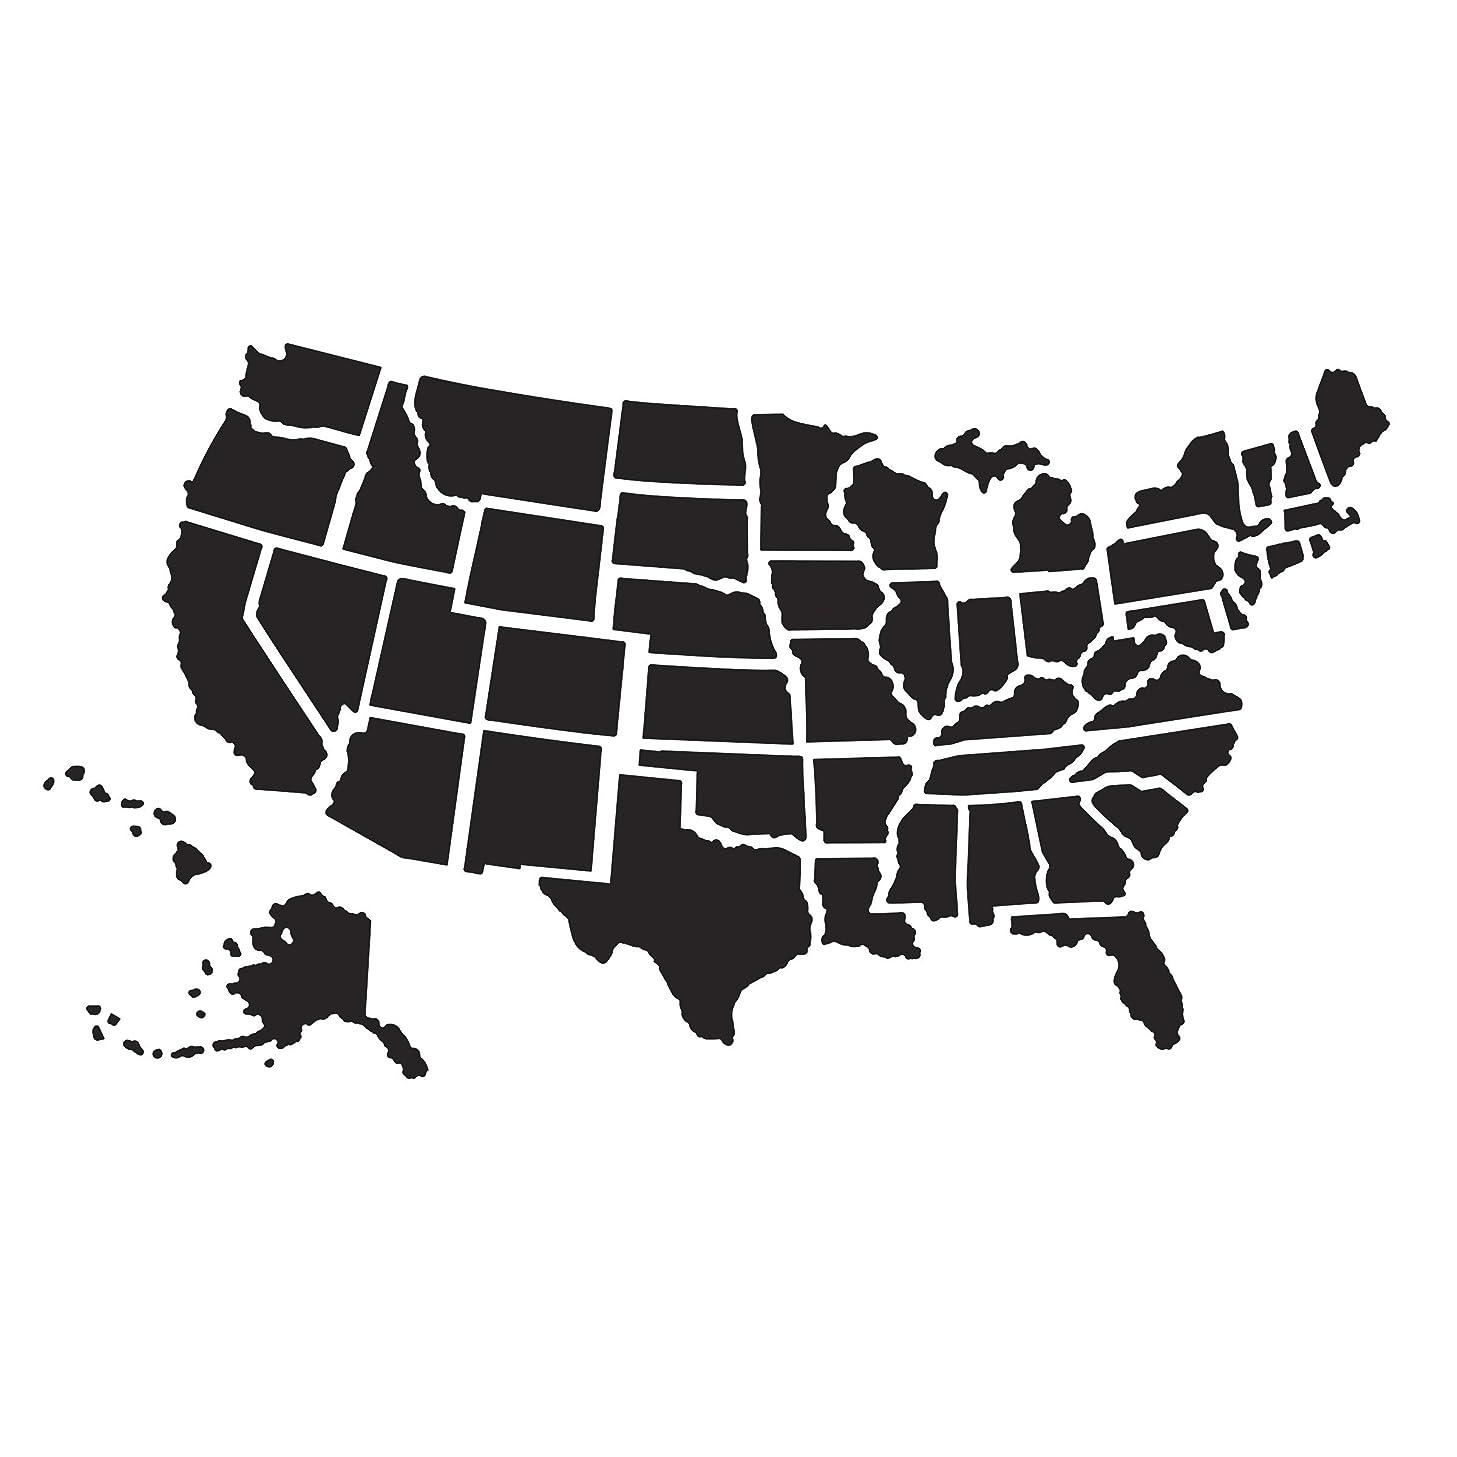 Darice Embossing Folder: U.S. Map, 4.25 x 5.75 inches